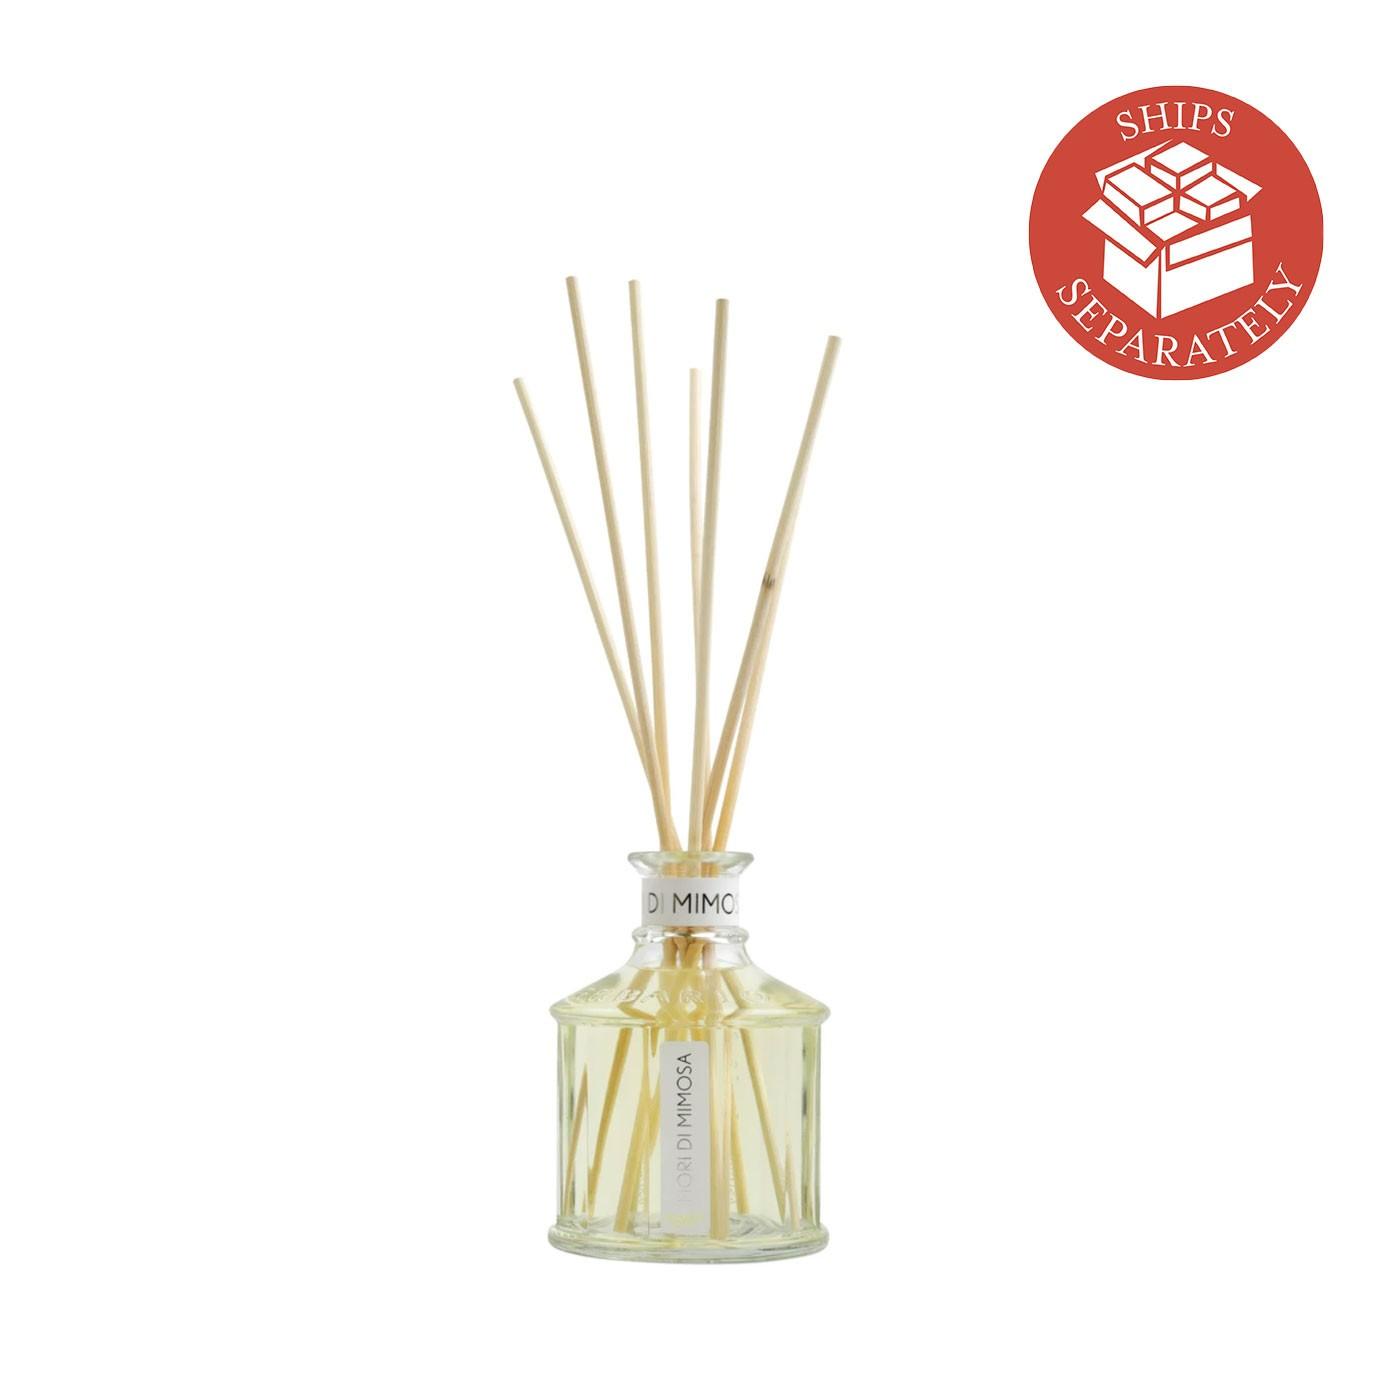 Mimosa Flowers Fragrance Diffuser 3.4 oz - Erbario Toscano   Eataly.com